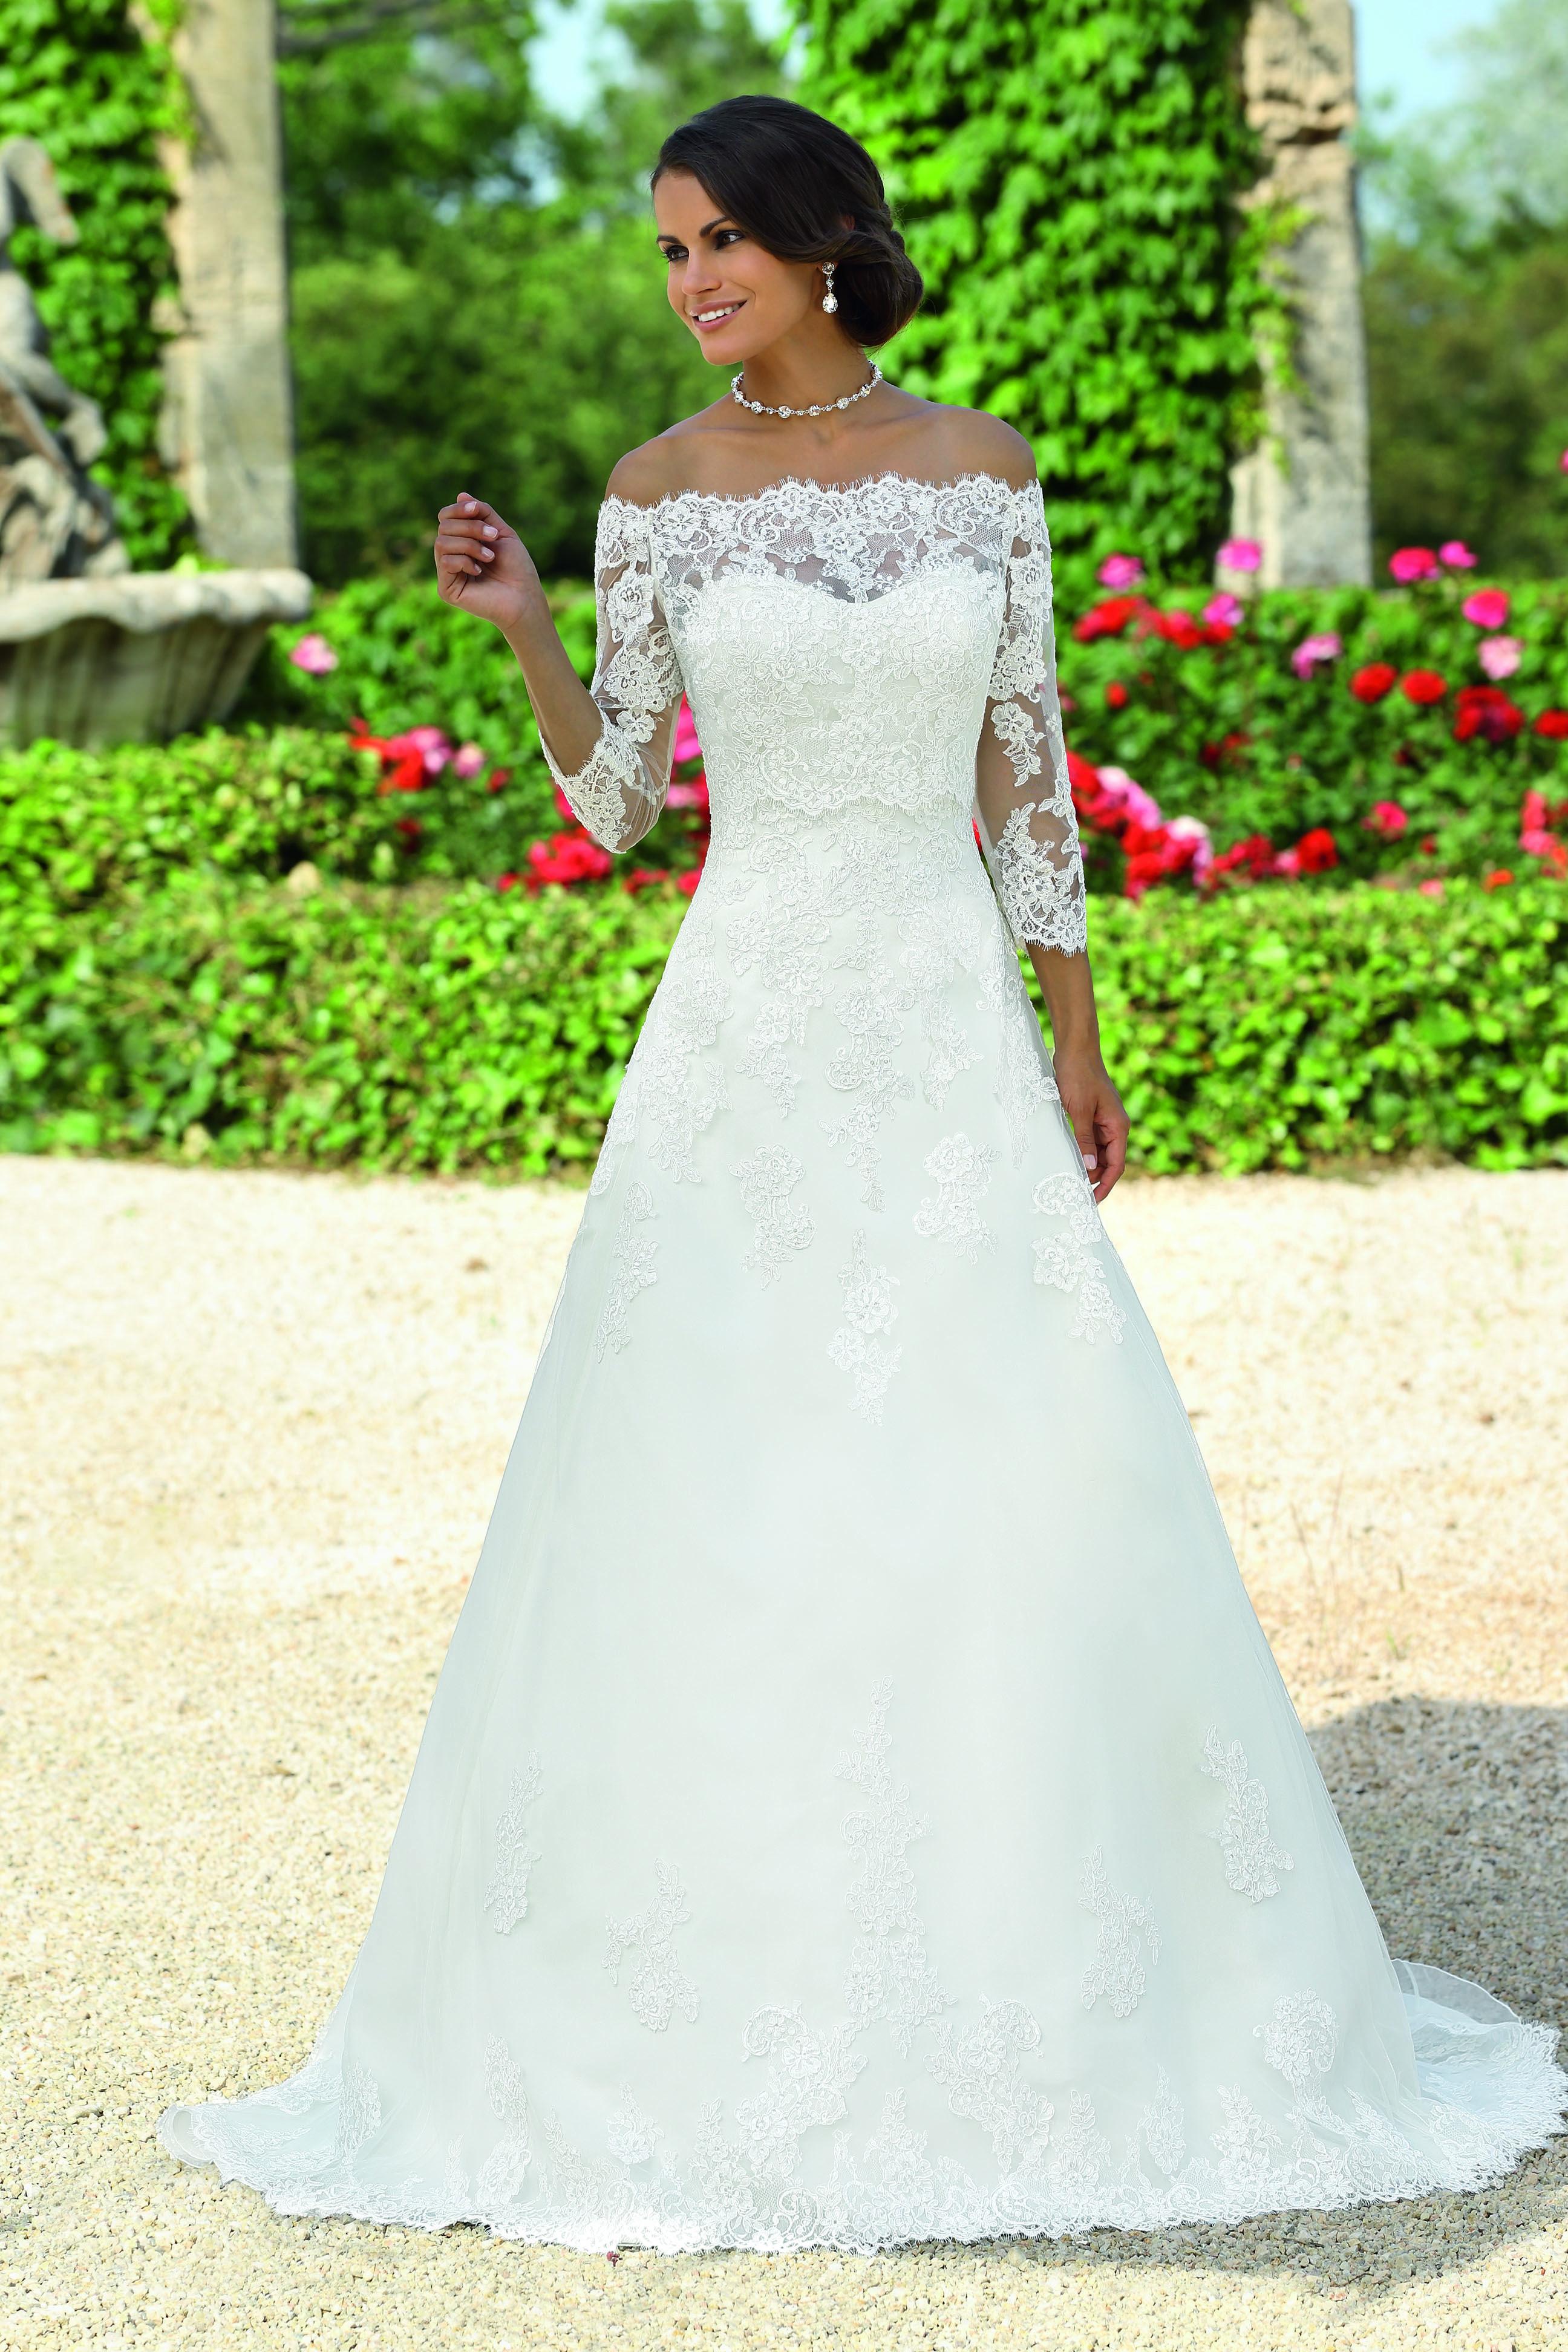 Pin by Marion on Brautkleider | Pinterest | Wedding dress, Weddings ...